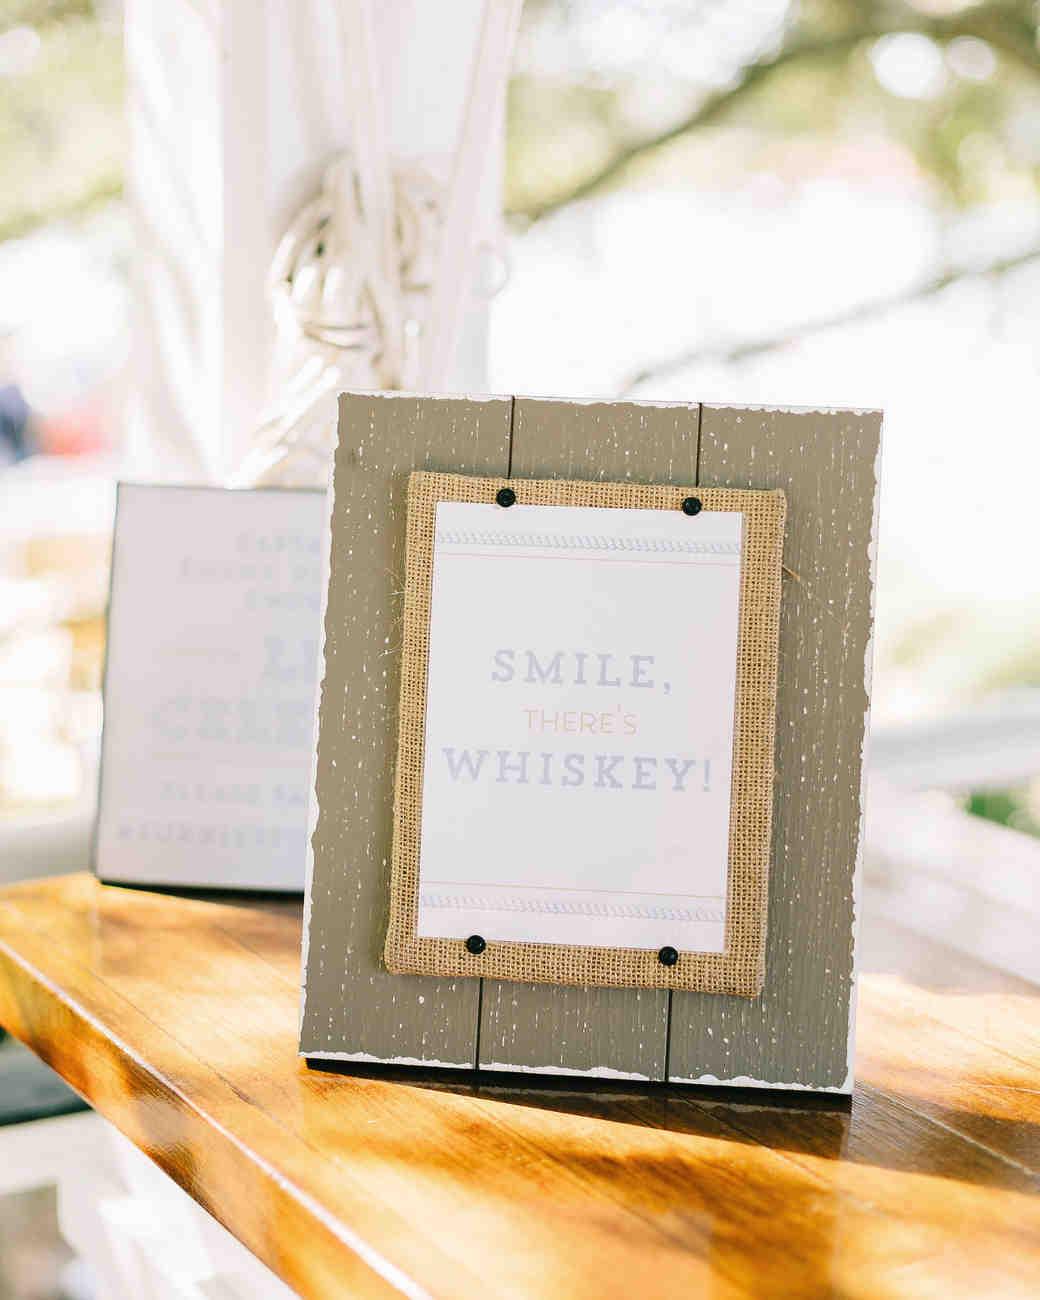 rachel-jurrie-nautical-wedding-whiskey-0214-s112778-0416.jpg